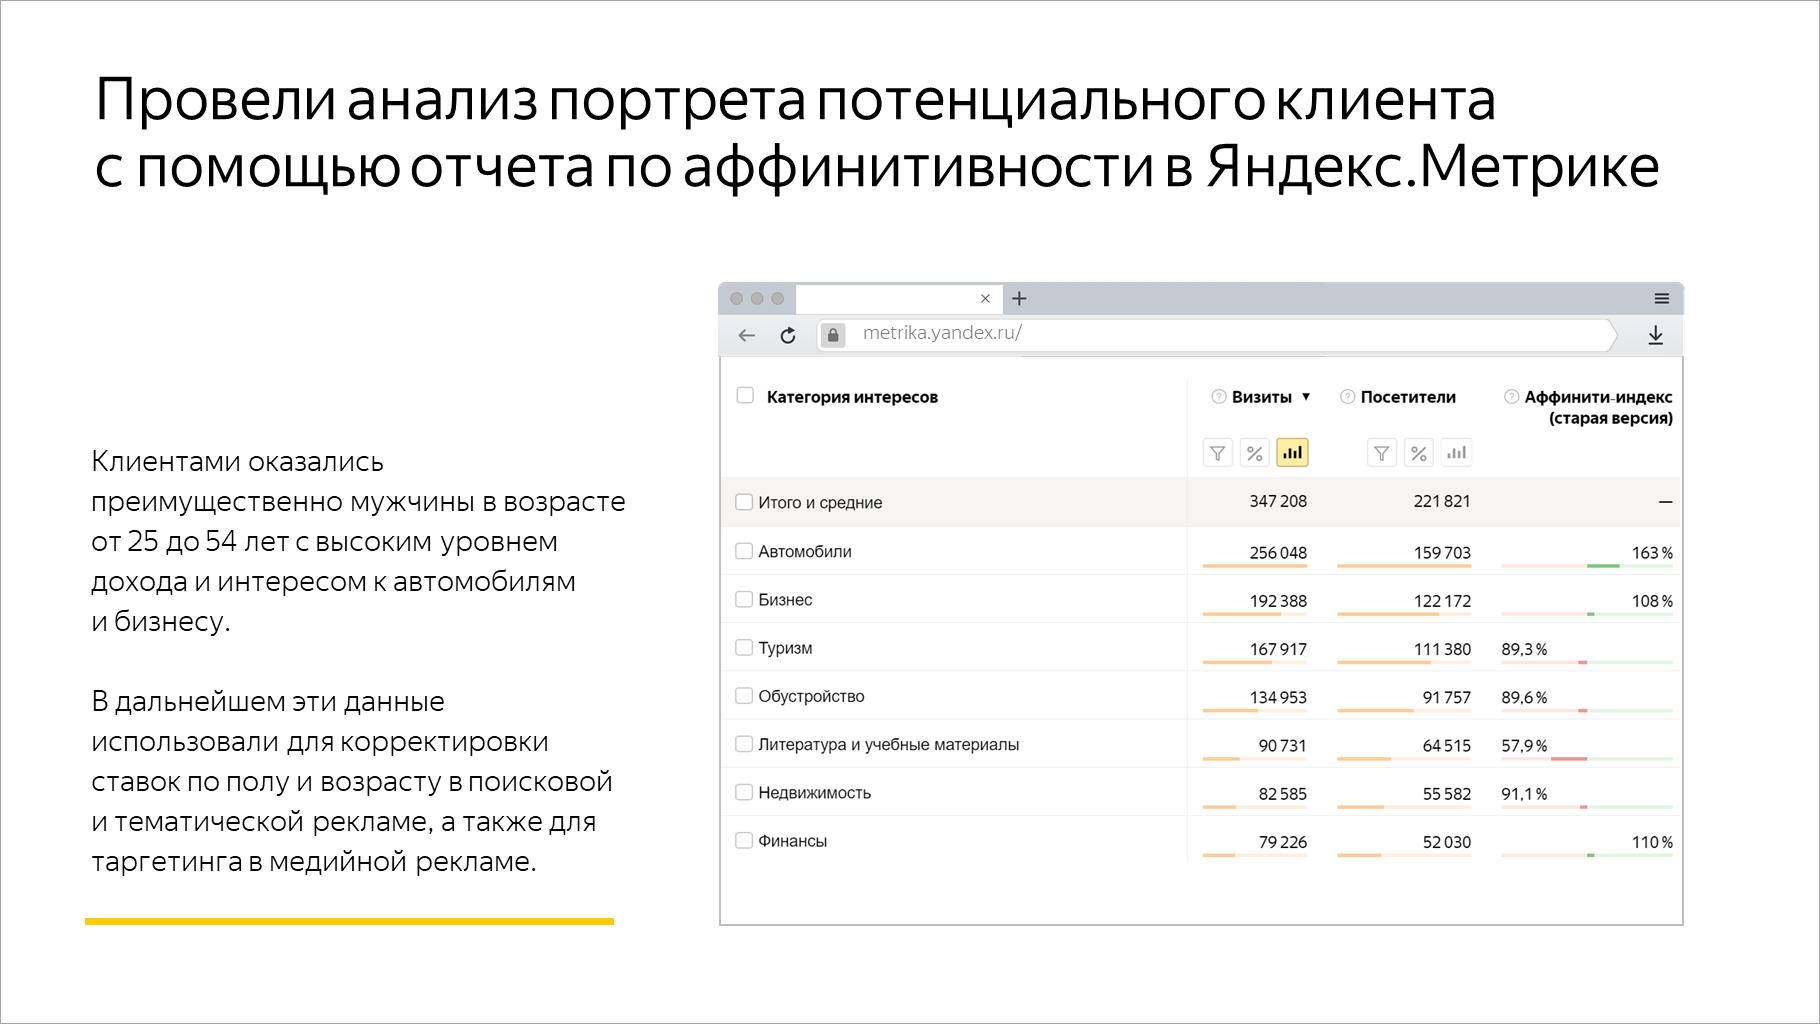 Провели анализ портрета потенциального клиента с помощью отчета по аффинитивности в Яндекс.Метрике